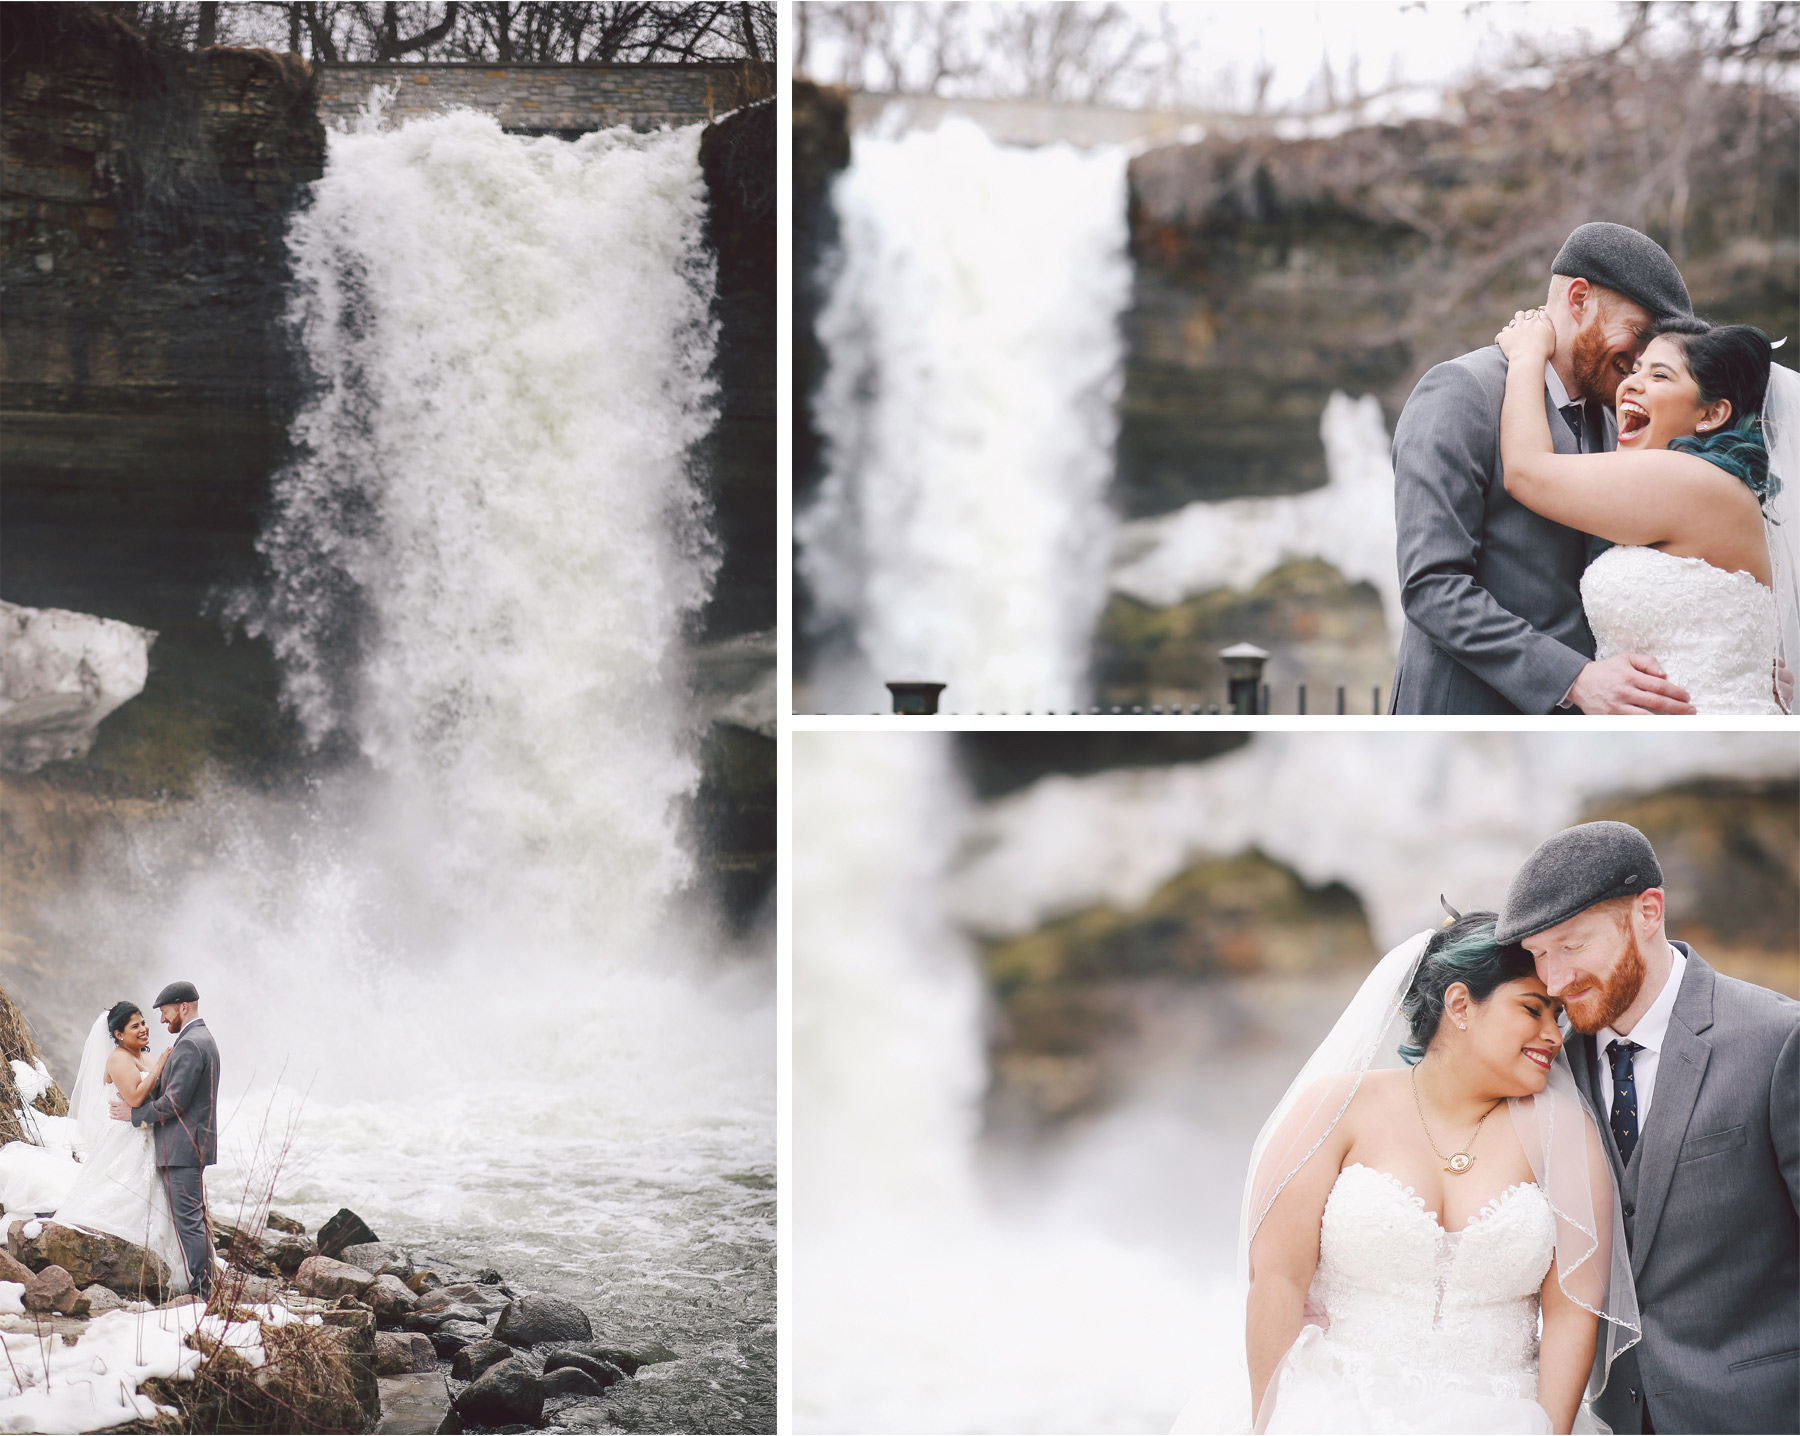 07-Saint-Paul-Minnesota-Wedding-Photography-by-Vick-Photography-Winter-Minnehaha-Spring-Bride-Groom-Elena-and-Doug.jpg